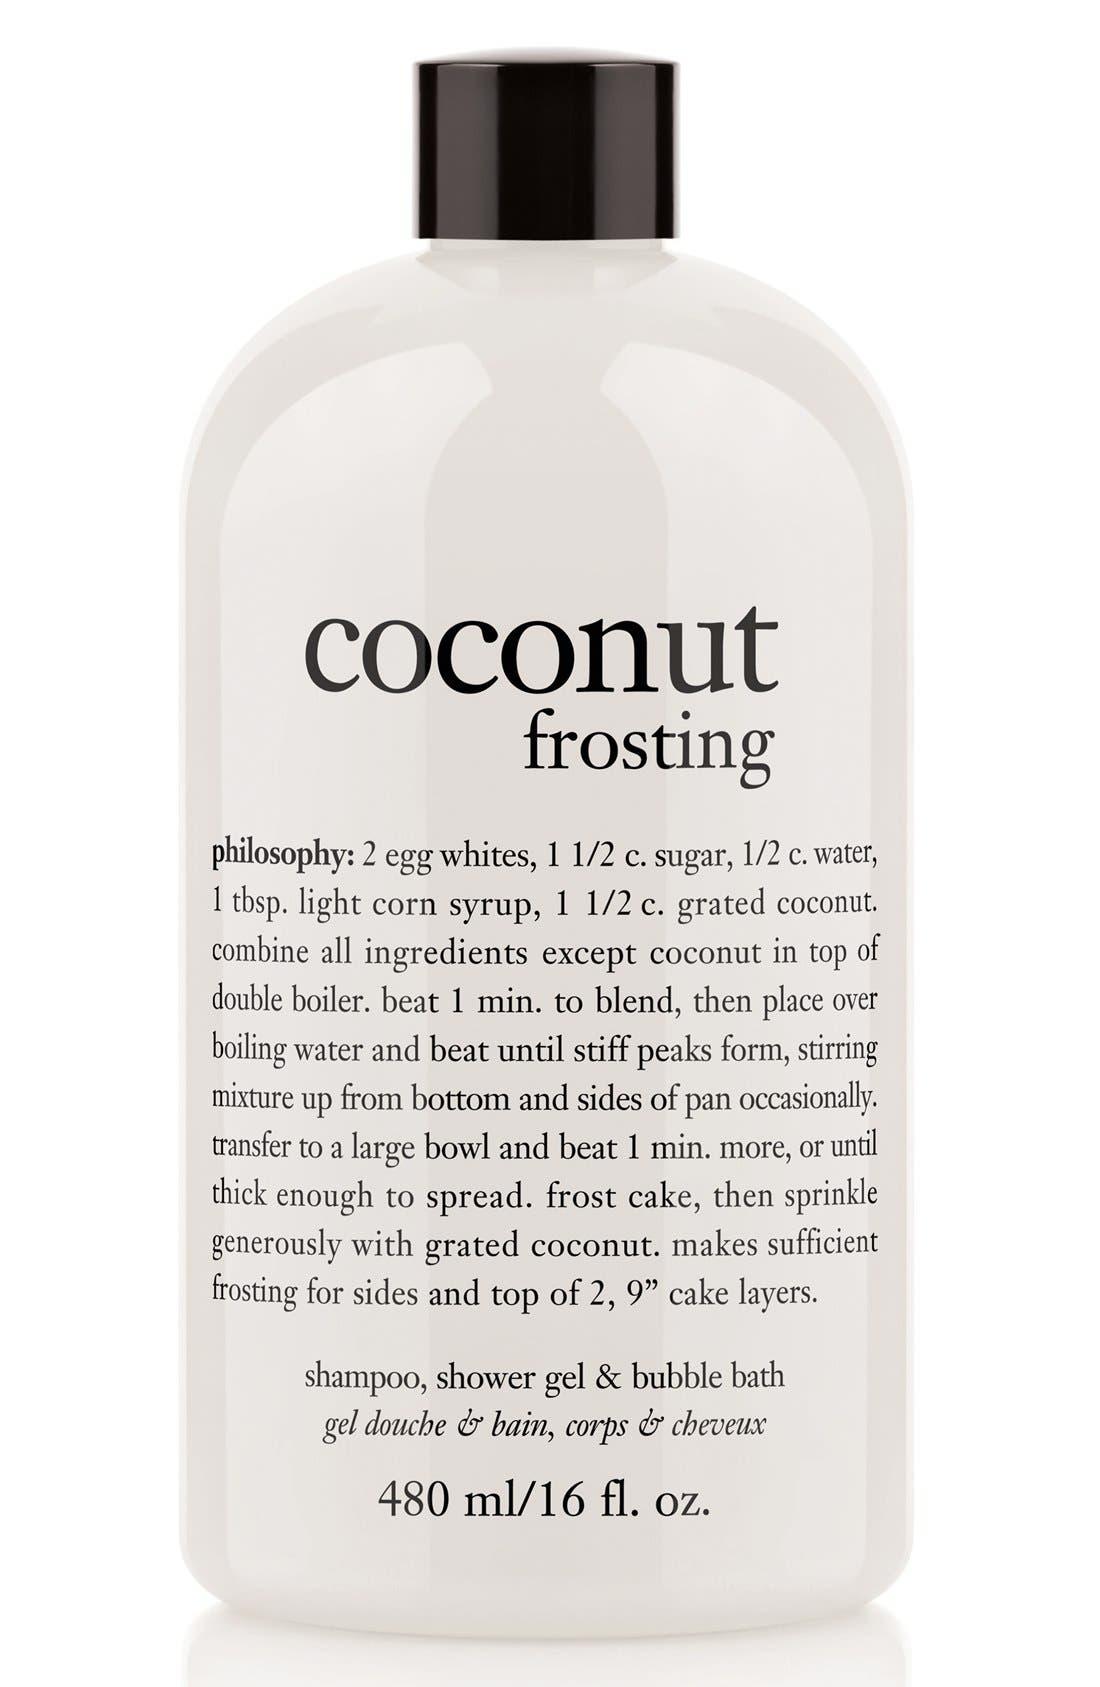 'coconut frosting' shampoo, shower gel & bubble bath, Main, color, COCONUT FROSTING